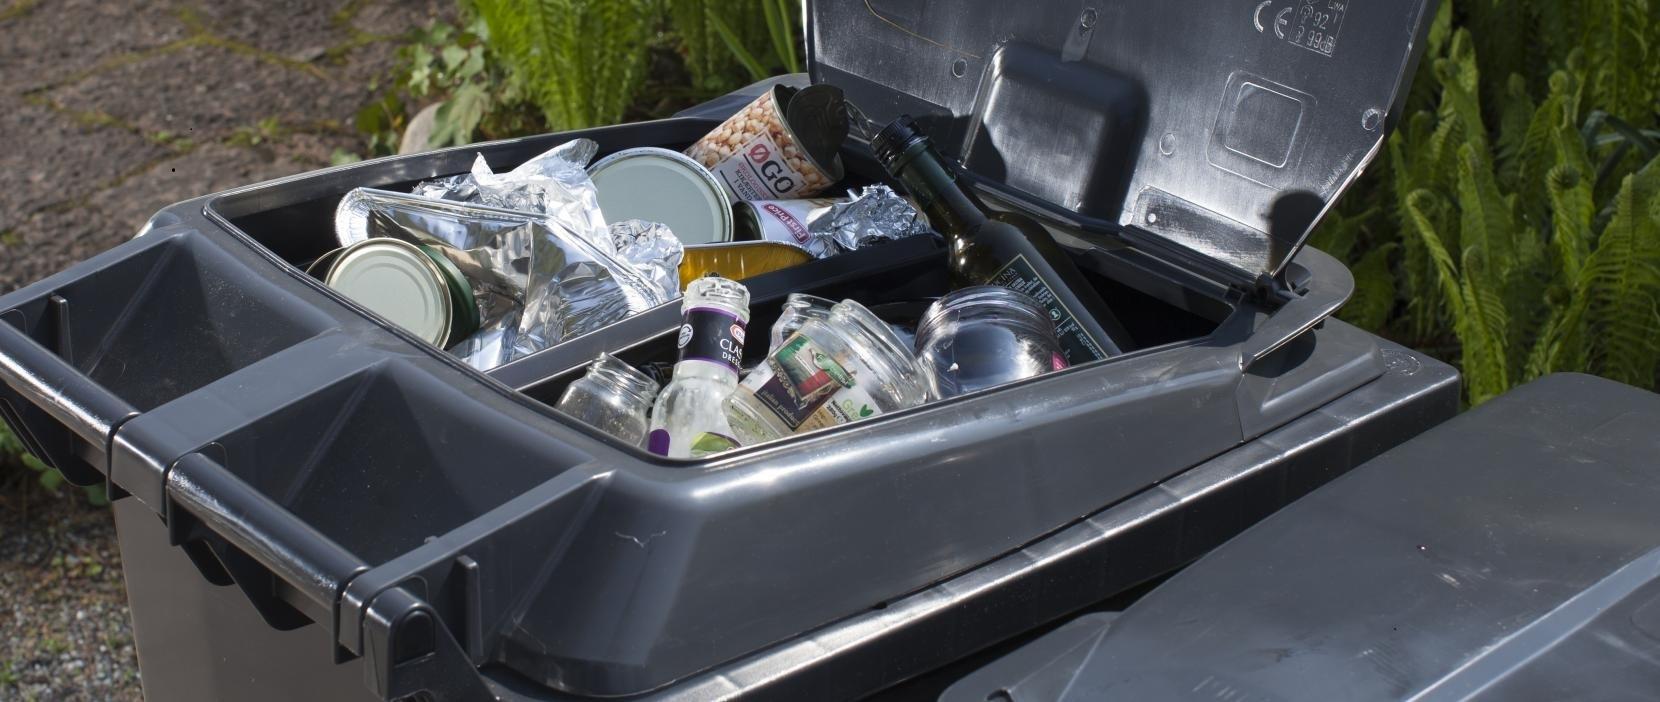 Generalforsamlinger - Affaldssortering Foto Rudersdal Kommune